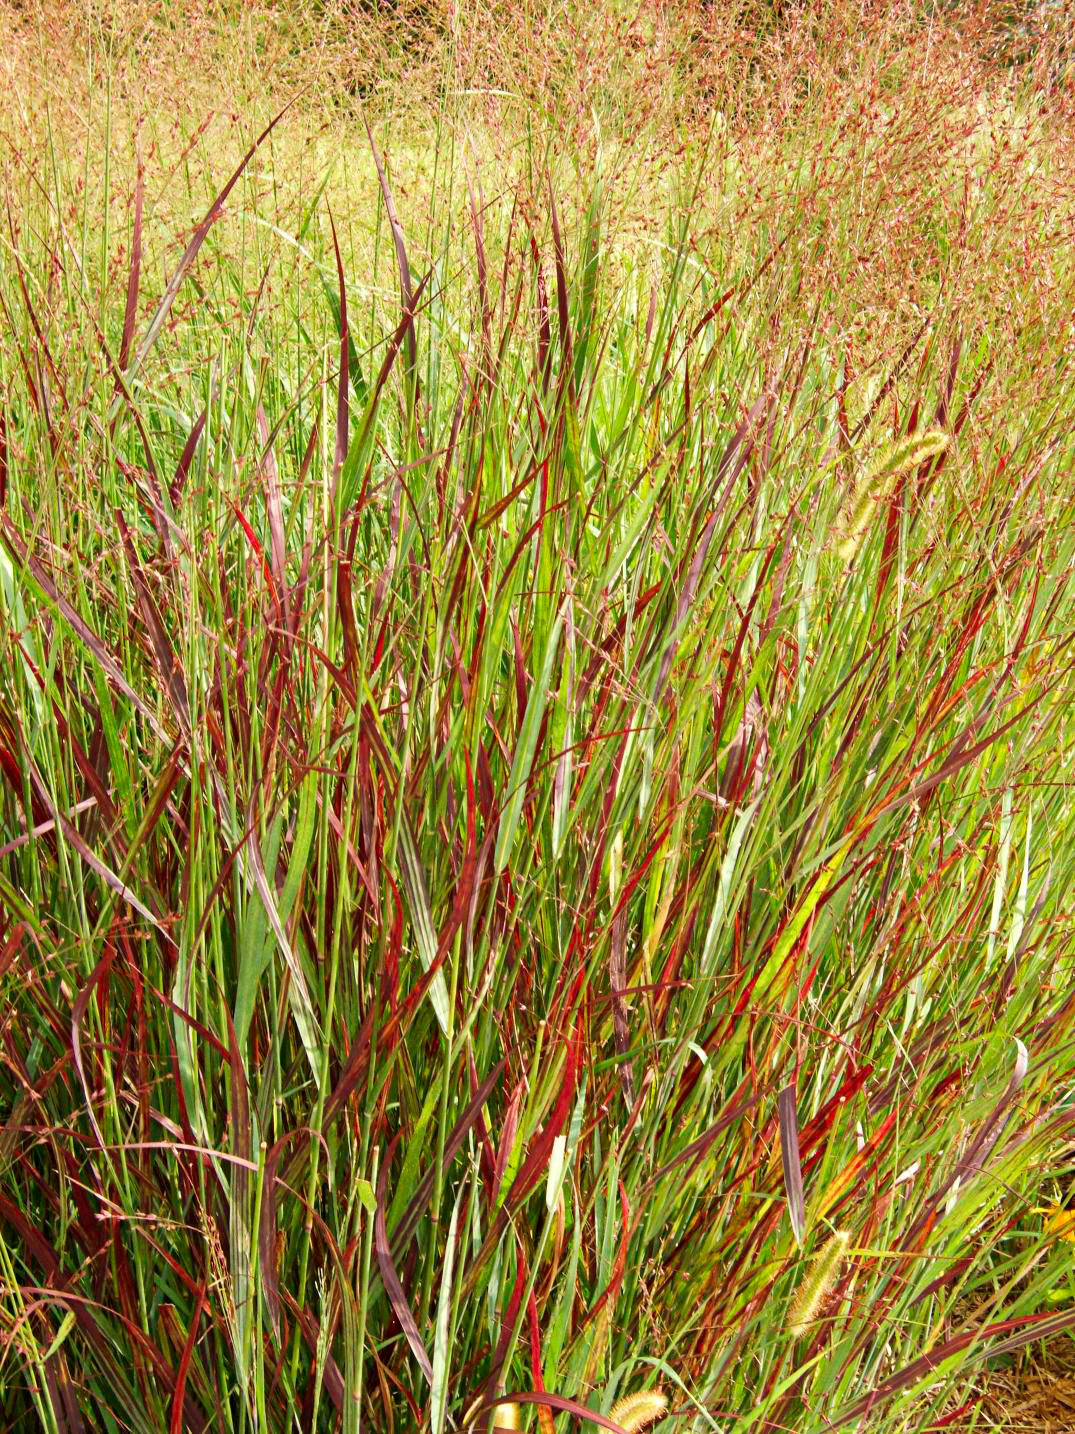 Switchgrass